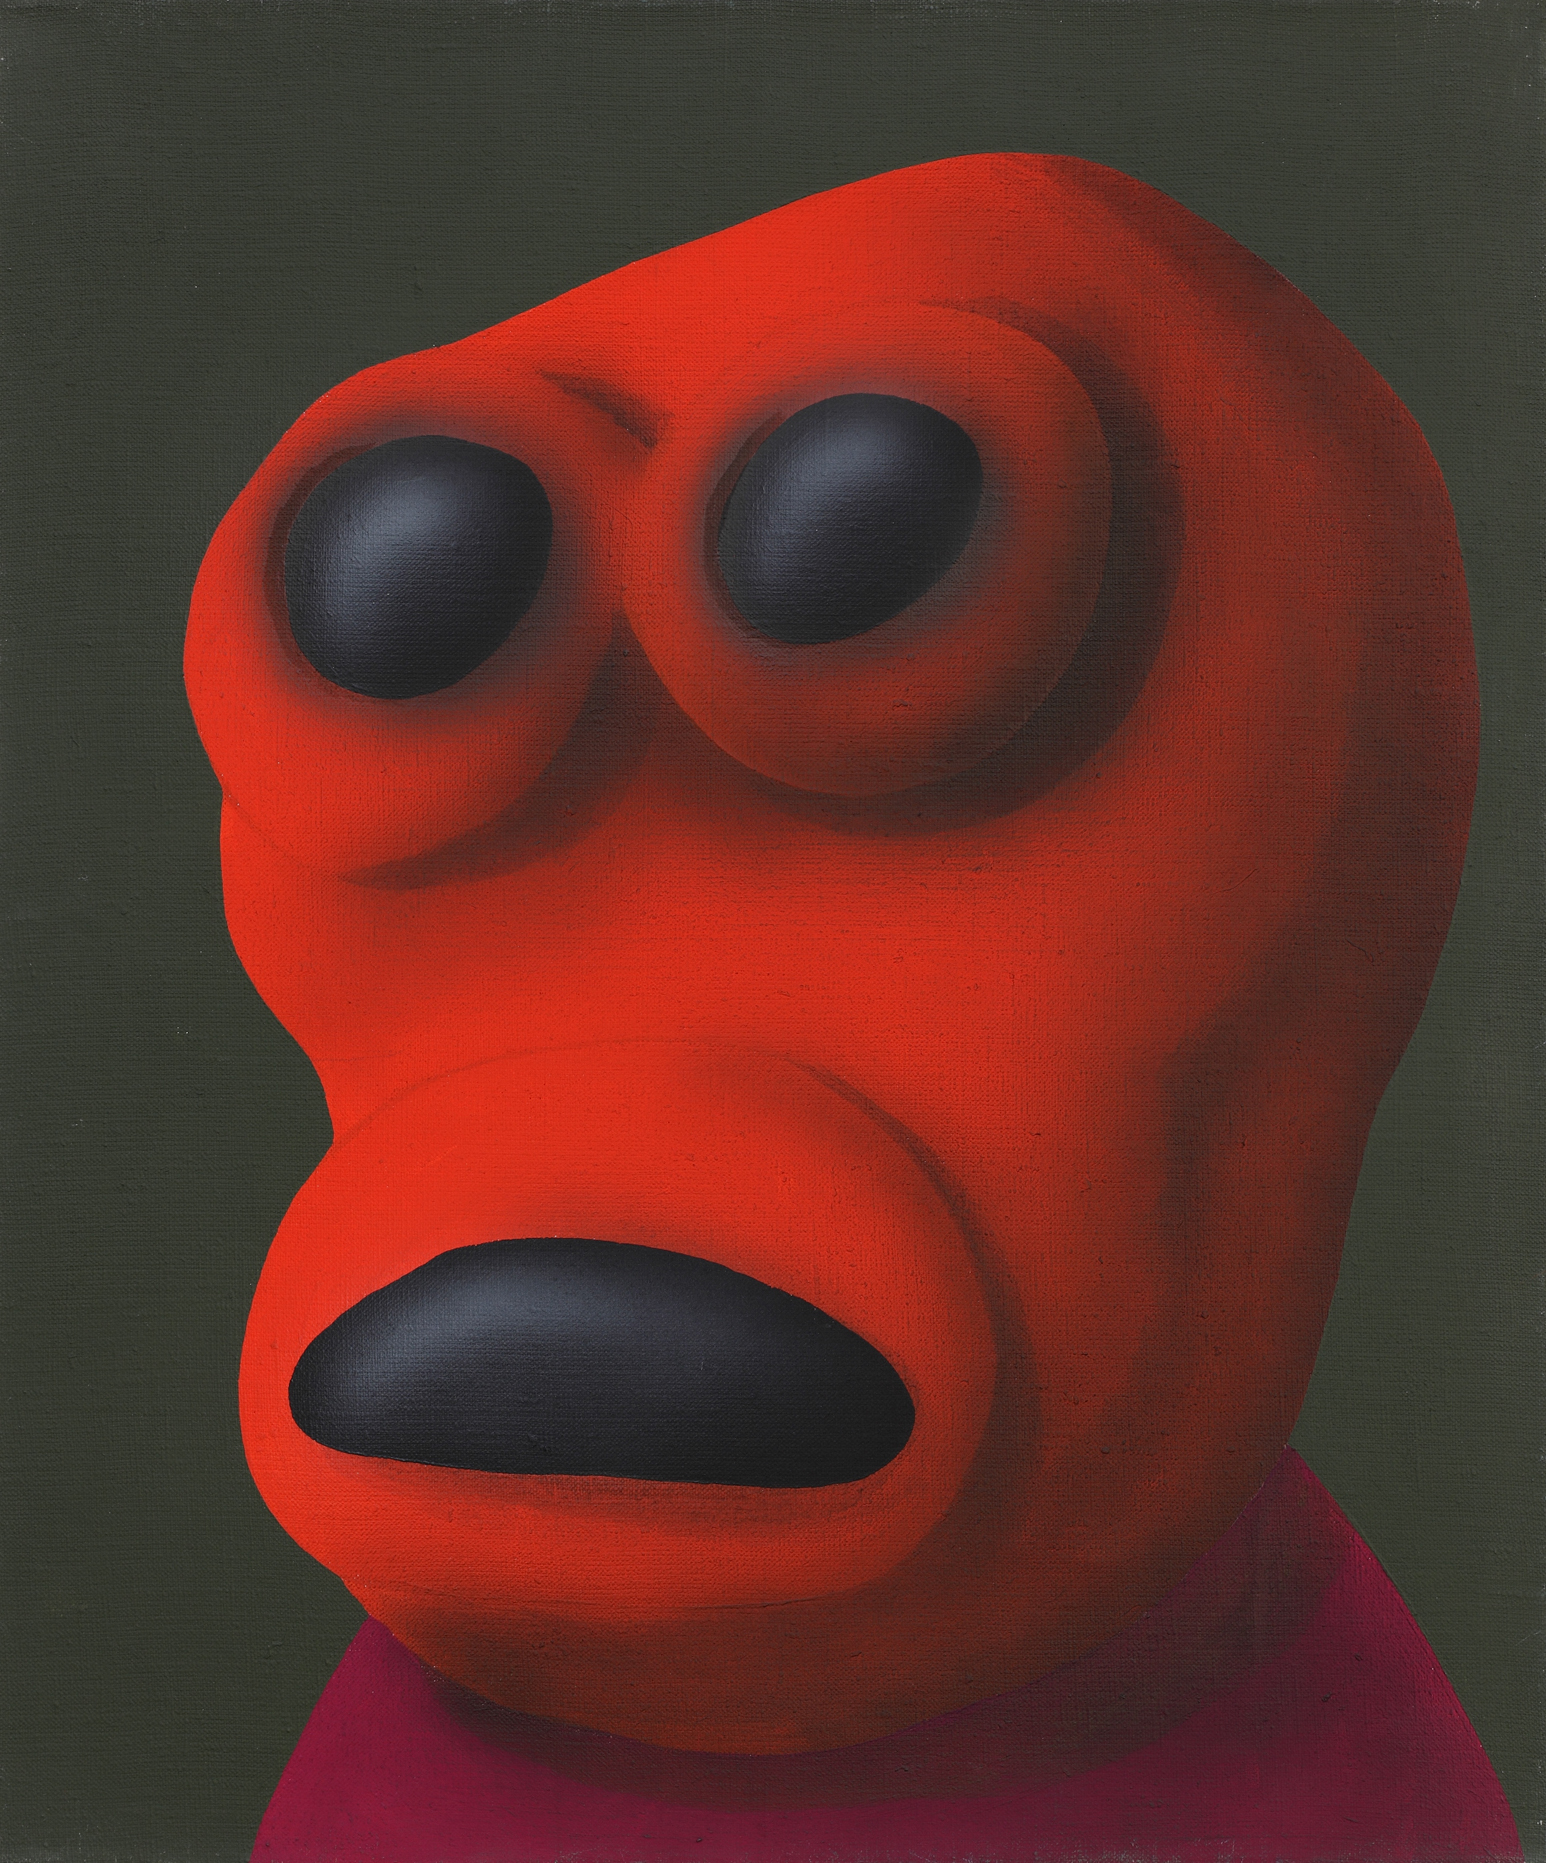 Ondra, 2007, acrylic on canvas, 70 x 60 cm